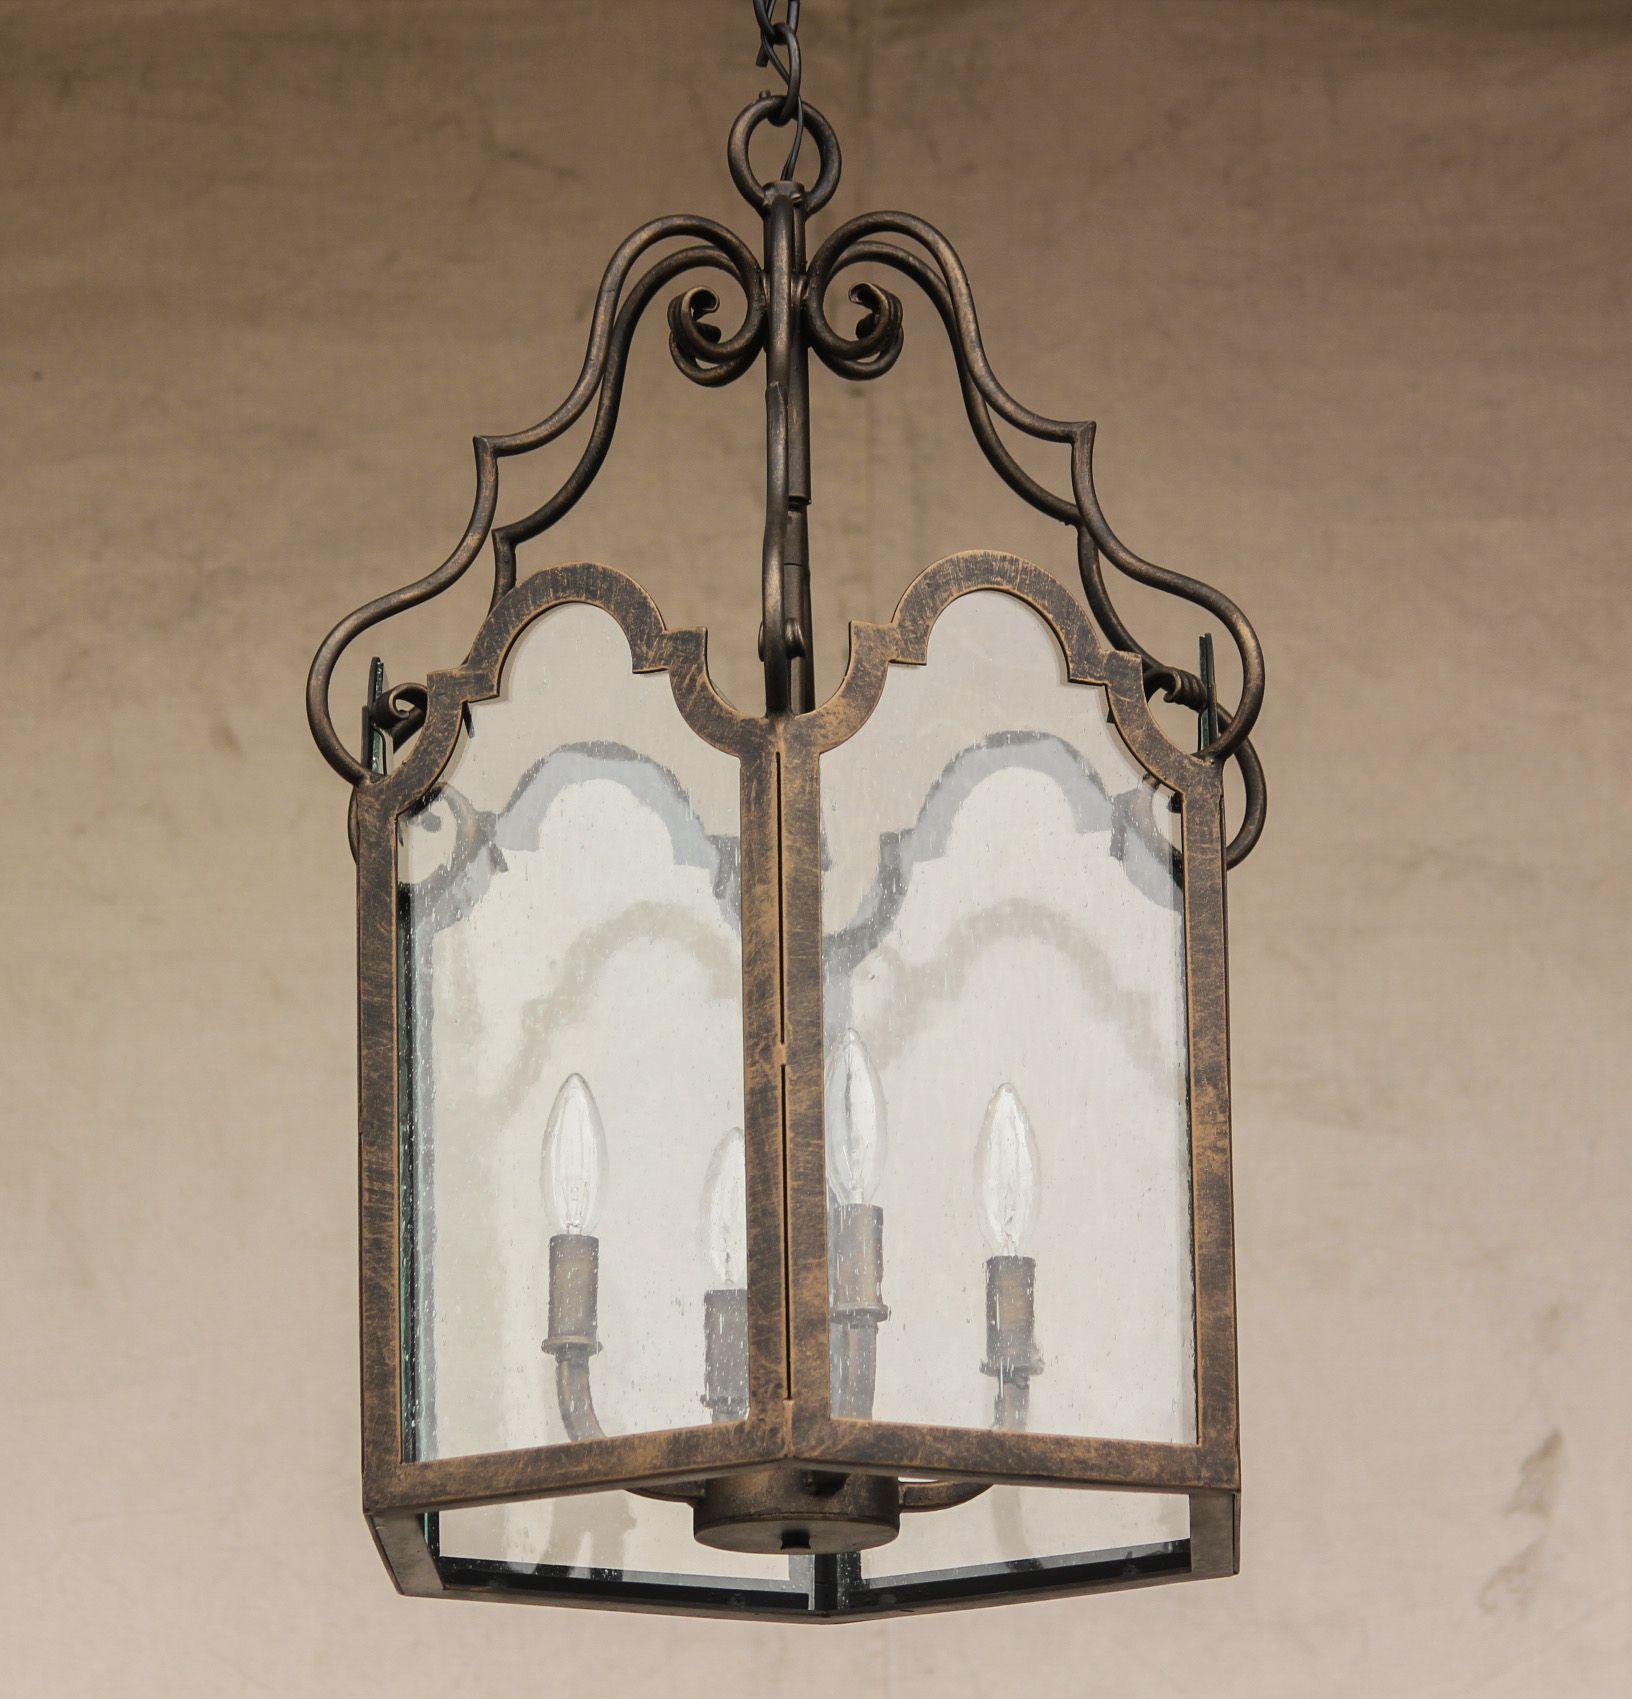 Lights of Tuscany 2145-3 Tuscan Style Lighting Fixture.